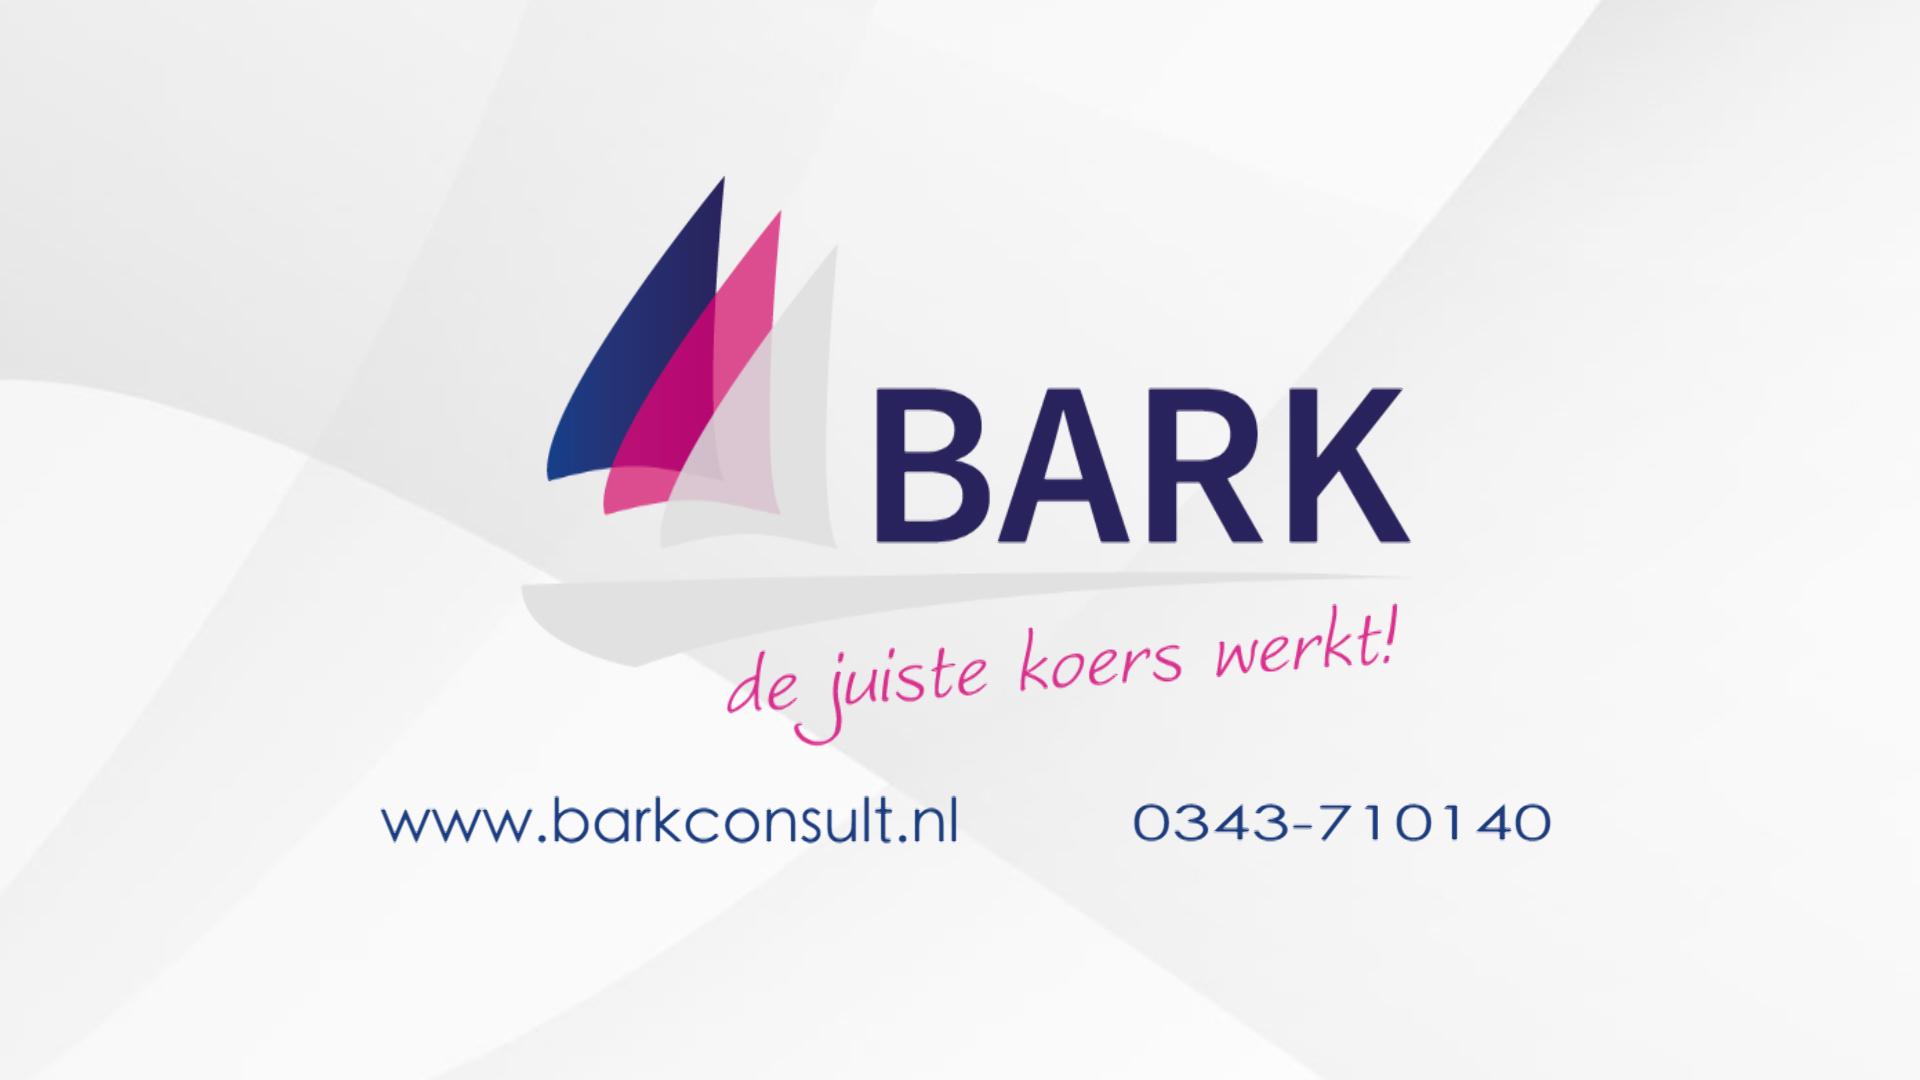 BARK consultancy